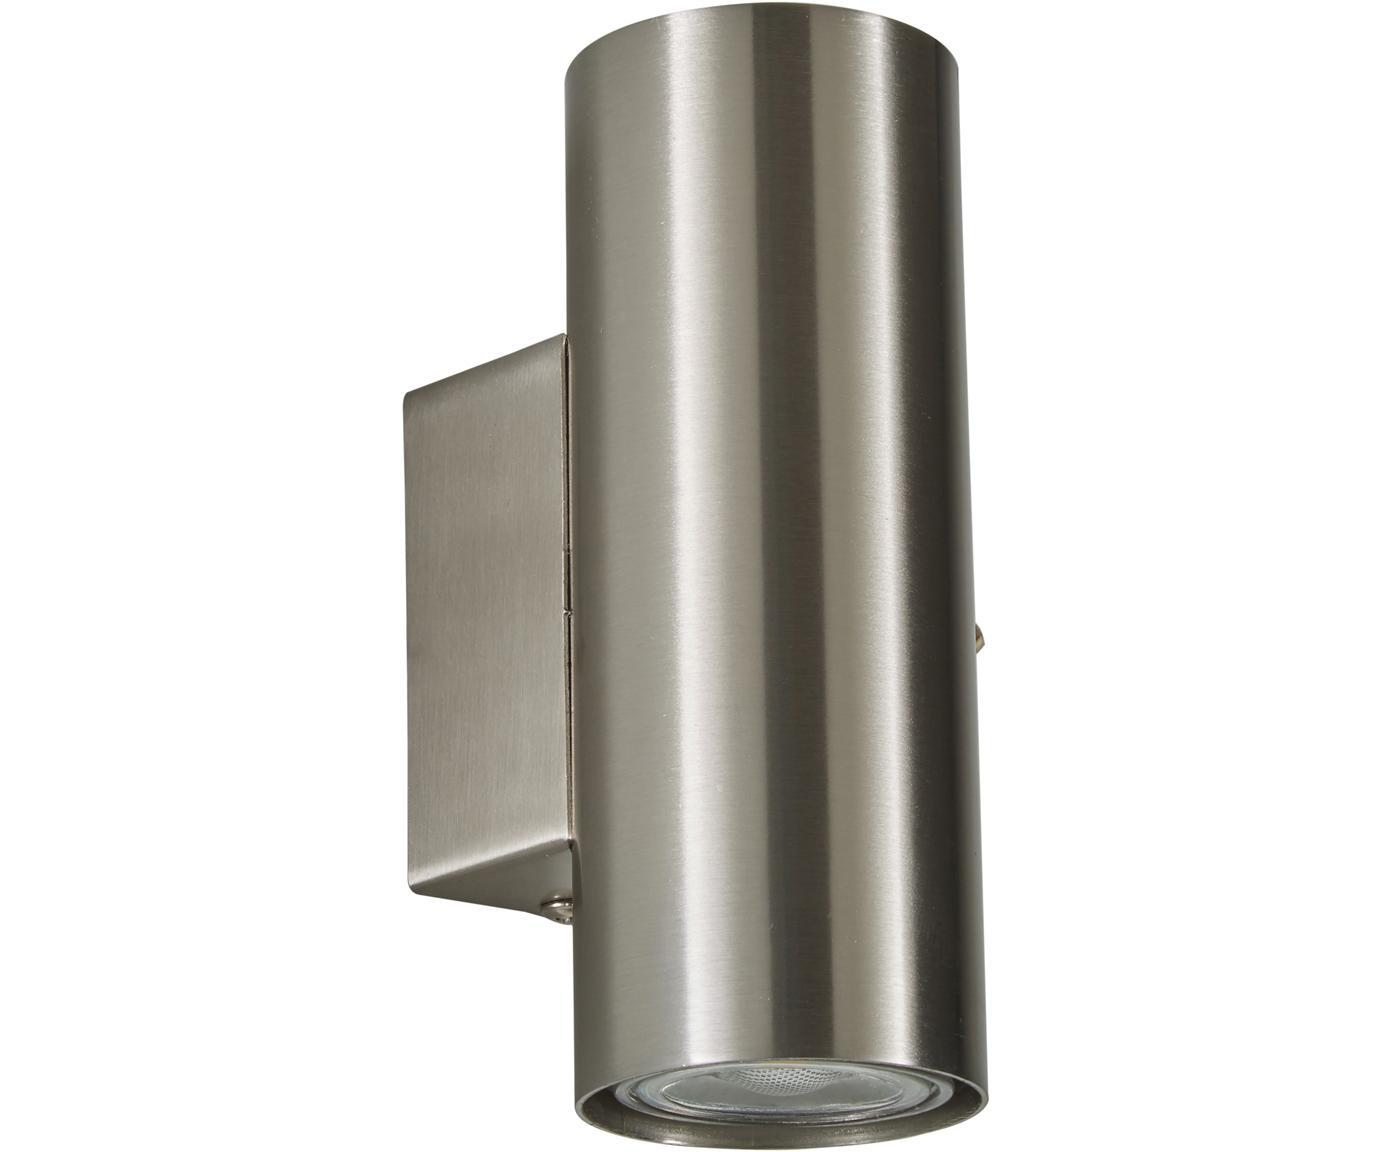 Aplique LED  Paul, Metal, cromado, Cromo, An 6 x Al 9 cm